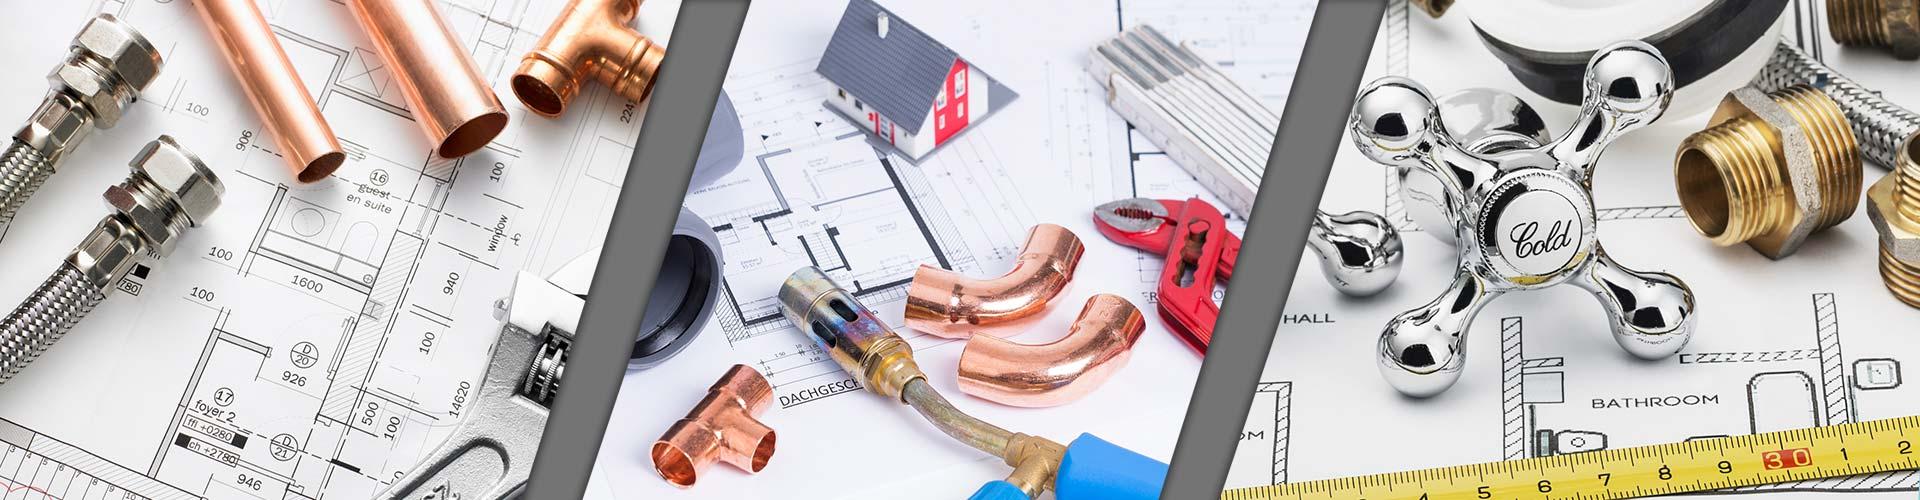 joniec plumbing extension and renovation plumbing equipments and plans